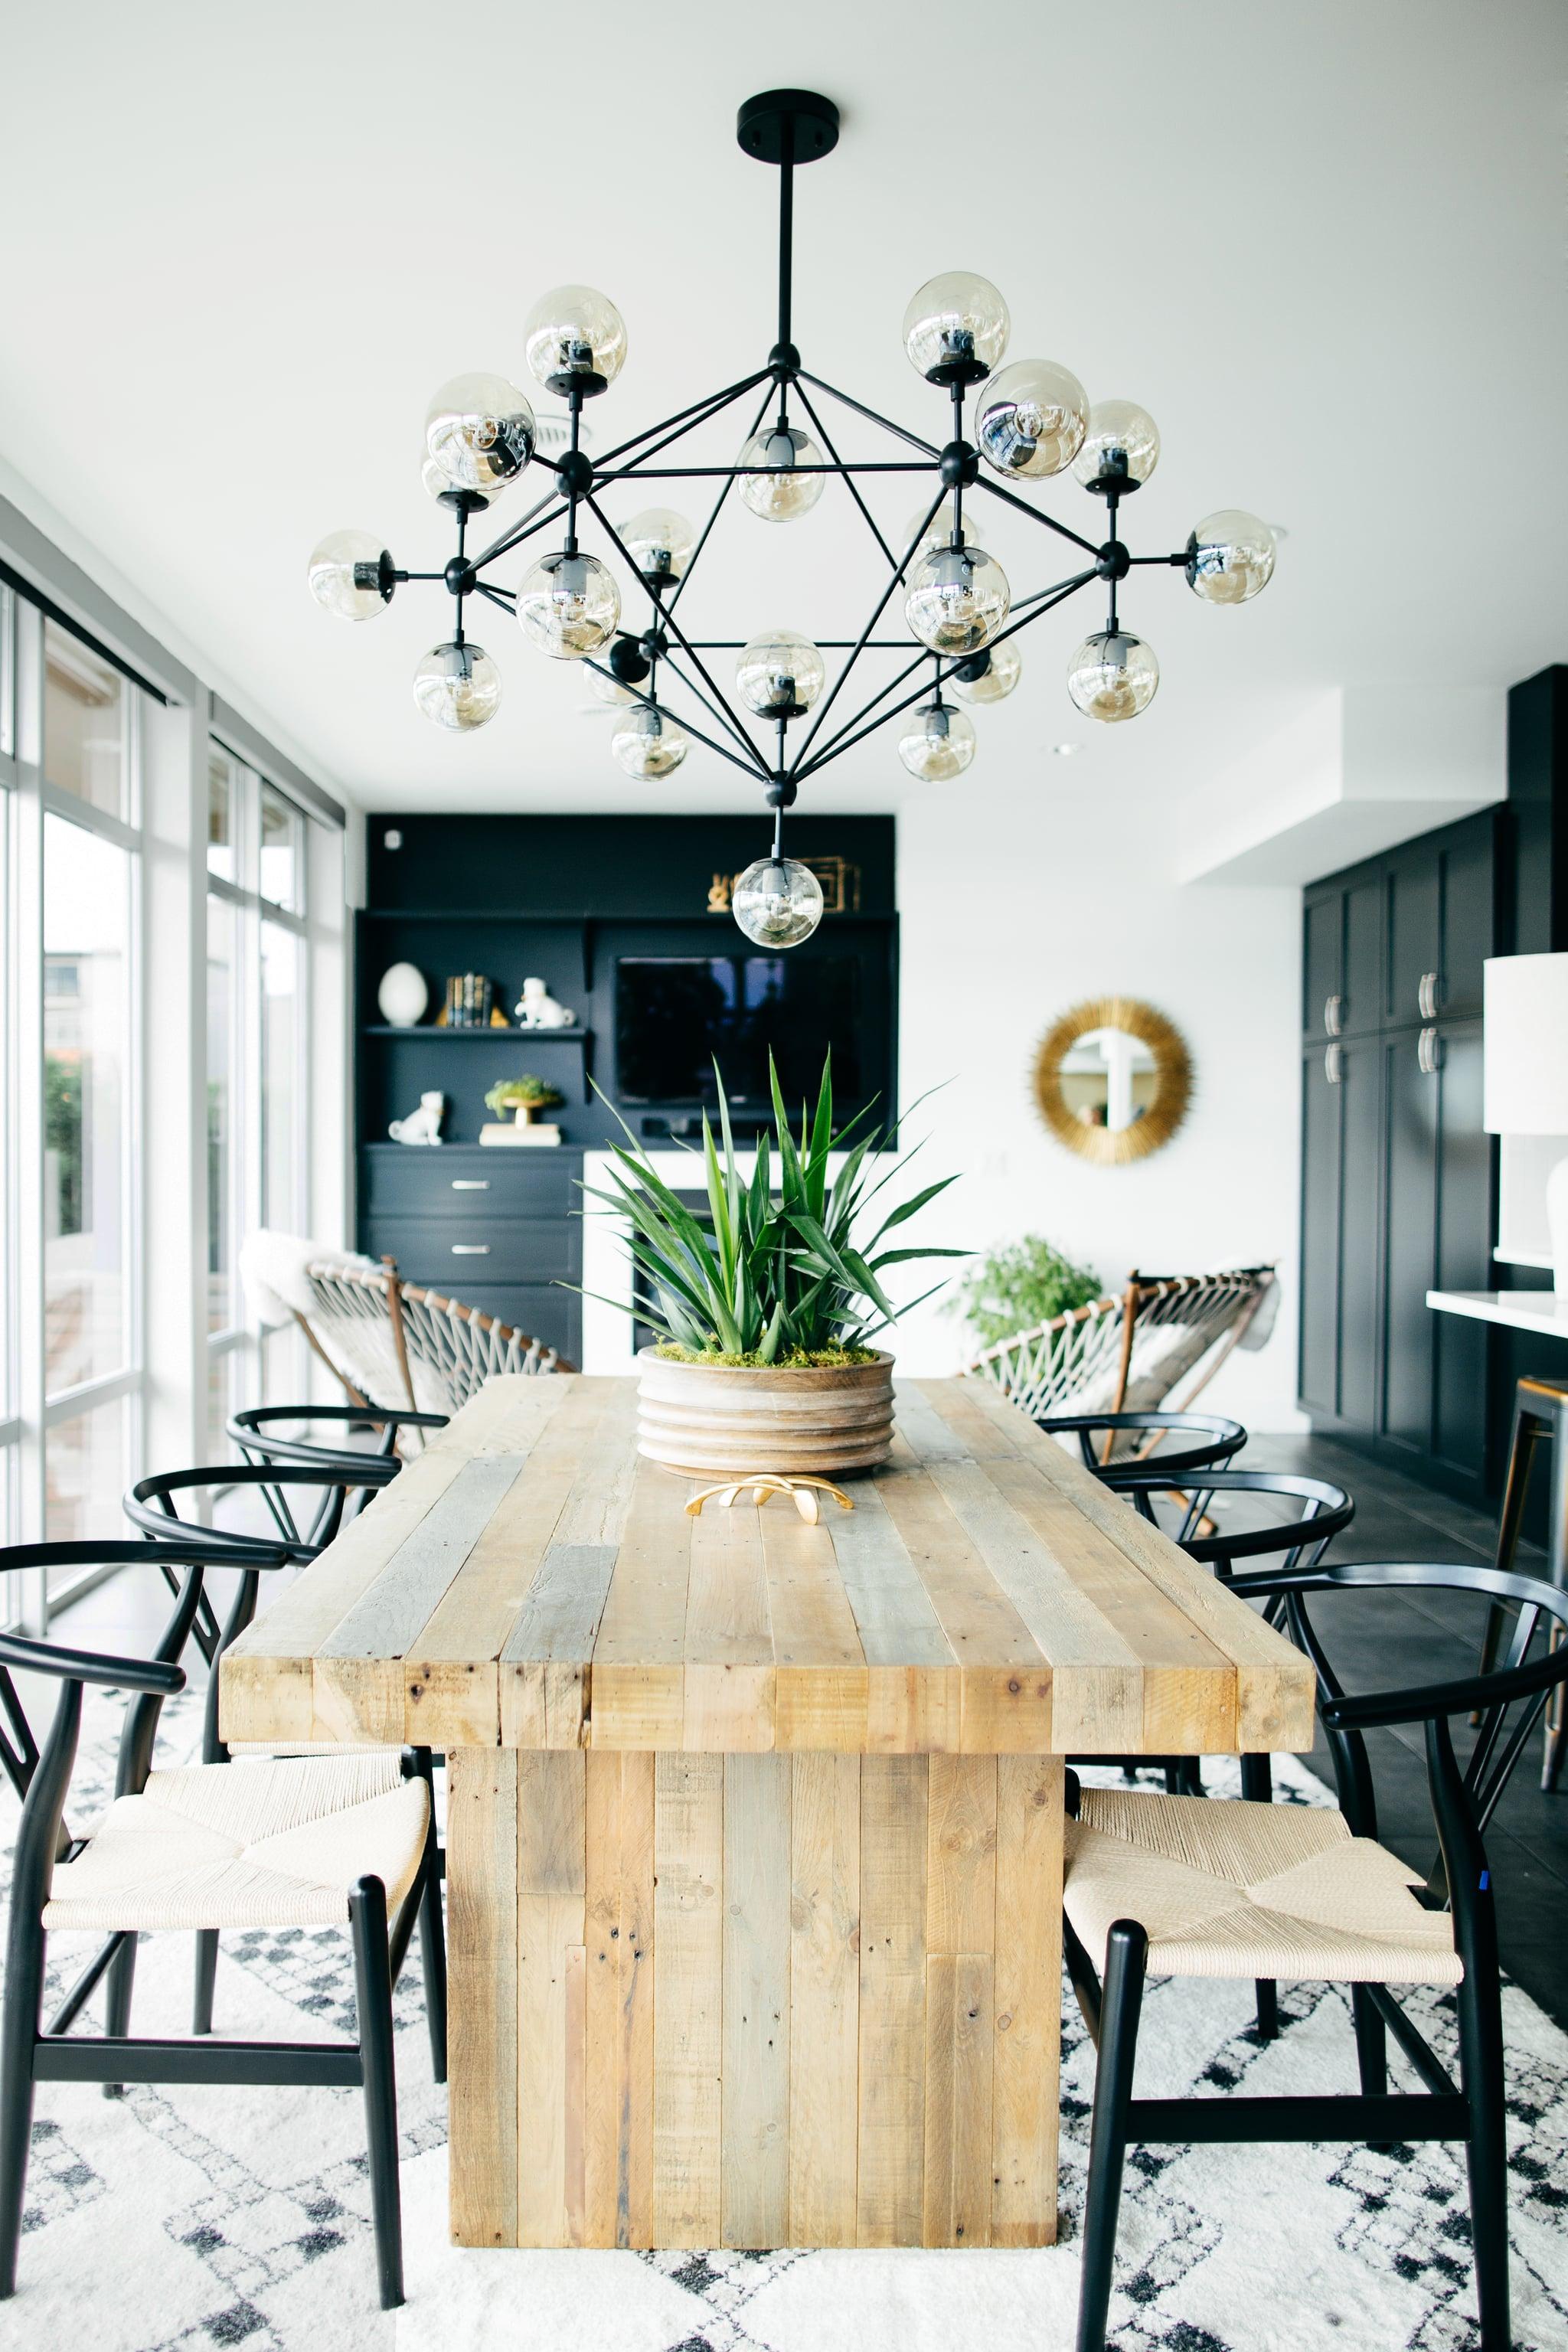 Best Places To Shop For Home Decor from media1.popsugar-assets.com